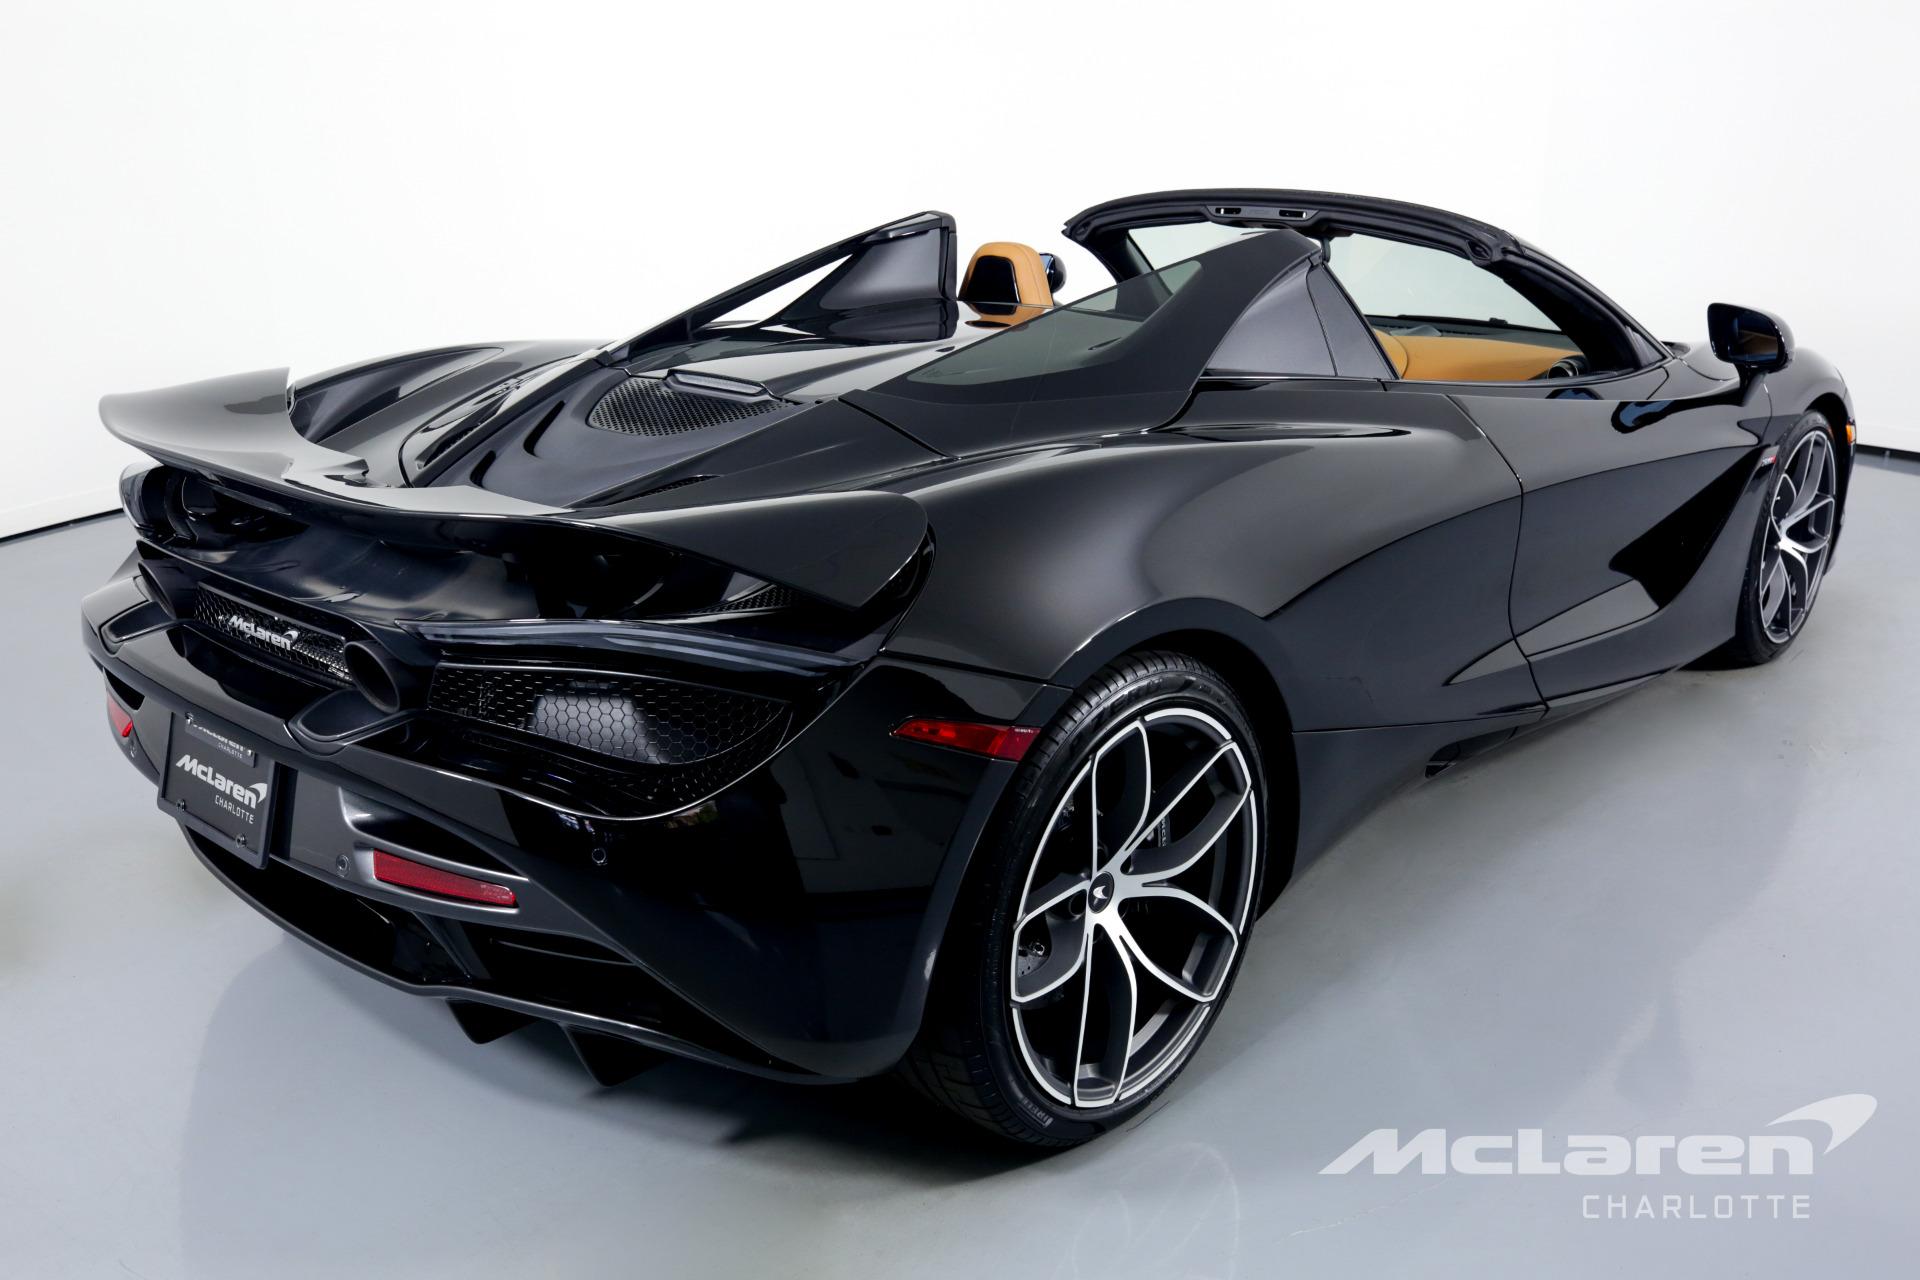 Used 2020 McLaren 720S Spider Luxury | Charlotte, NC